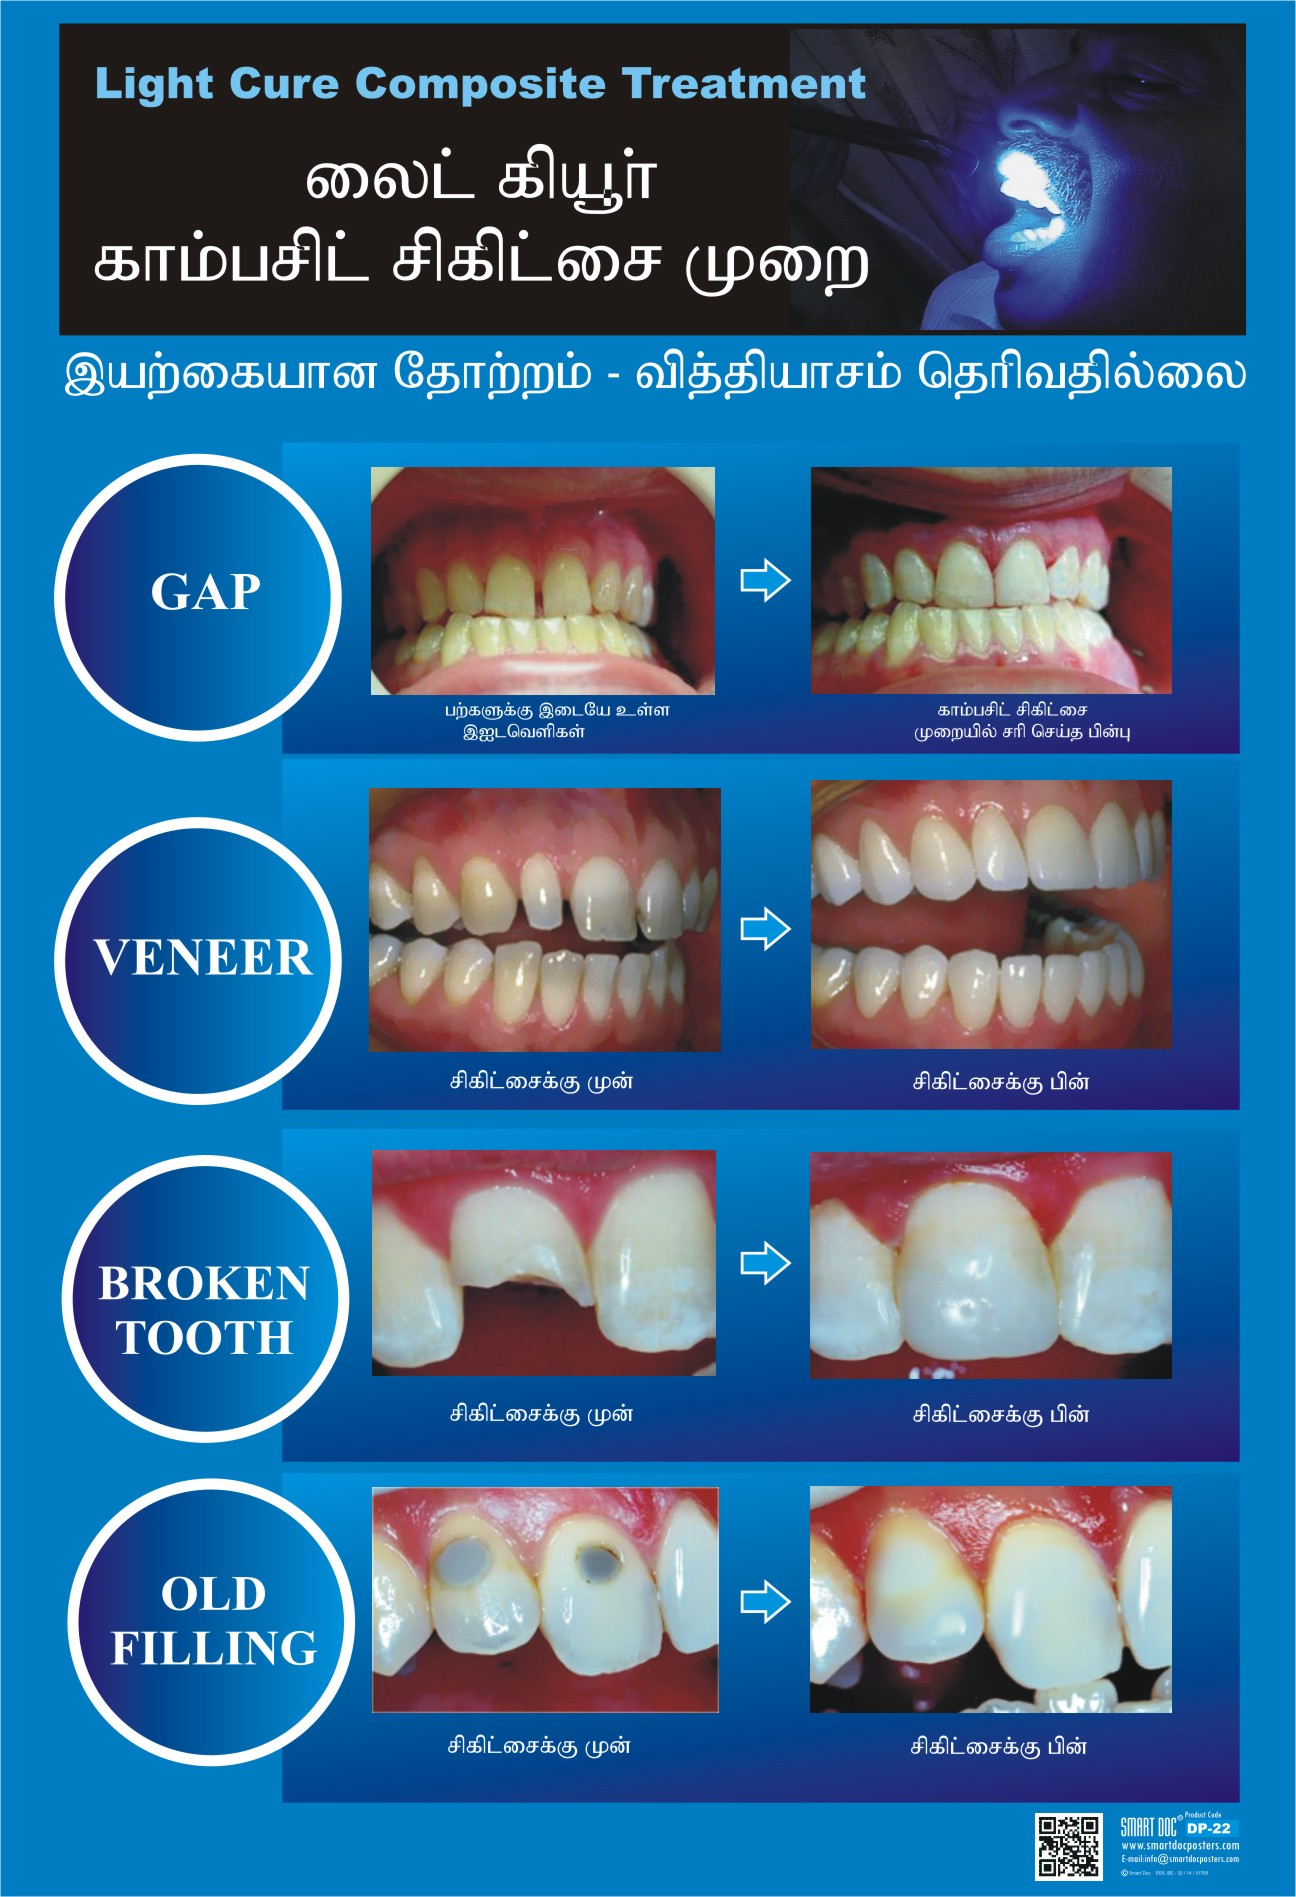 Composite Fillings Tamil Dp 22 T Smart Doc Posters